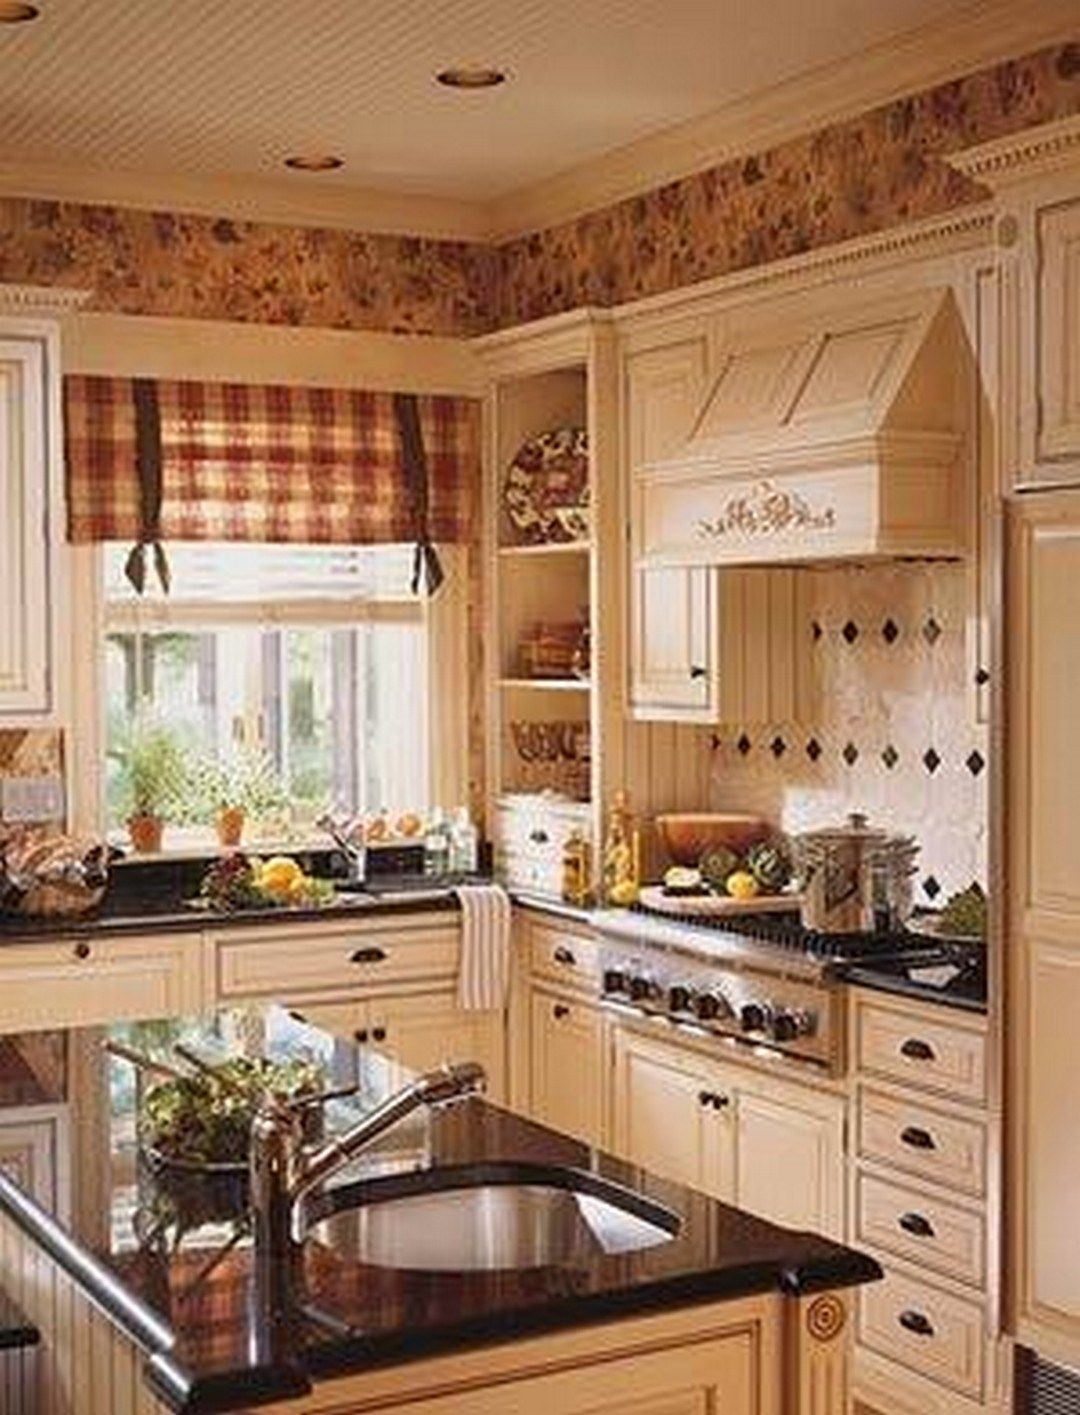 99 French Country Kitchen Modern Design Ideas (51) | Shauna\'s Dream ...